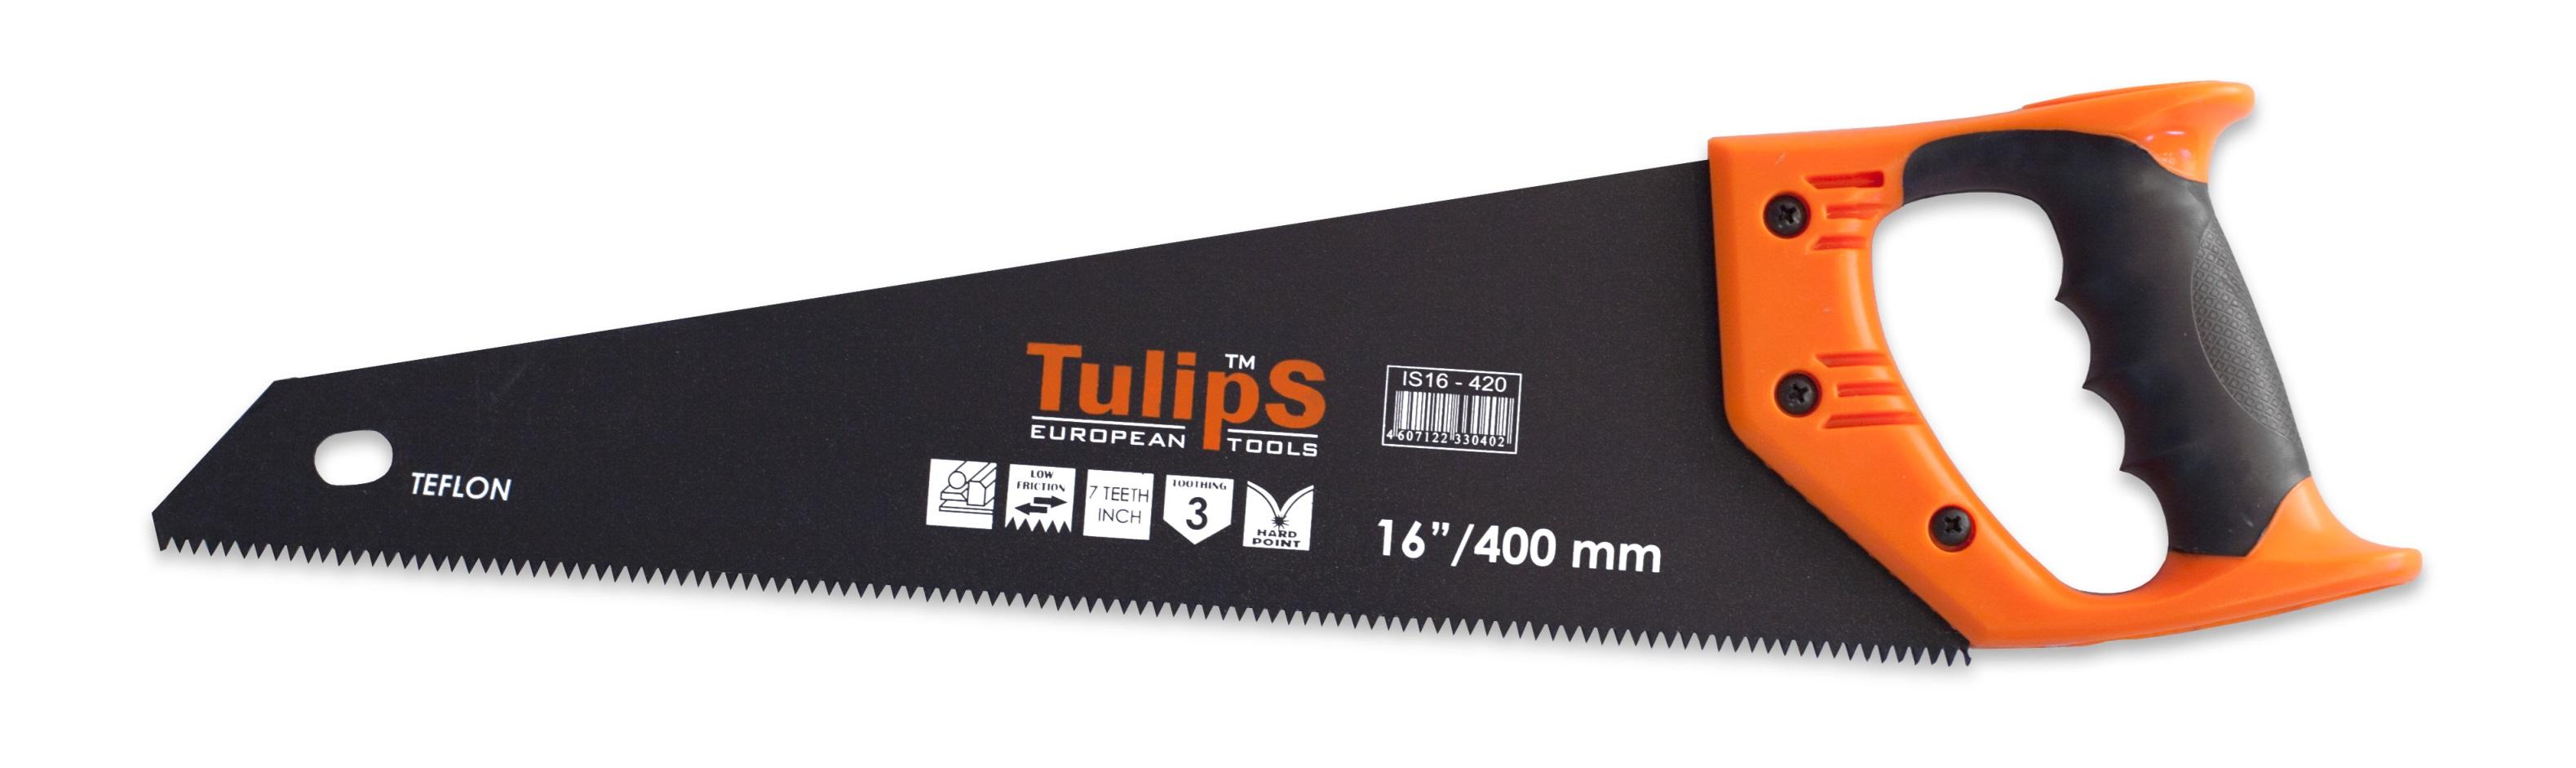 Ножовка по дереву Tulips tools